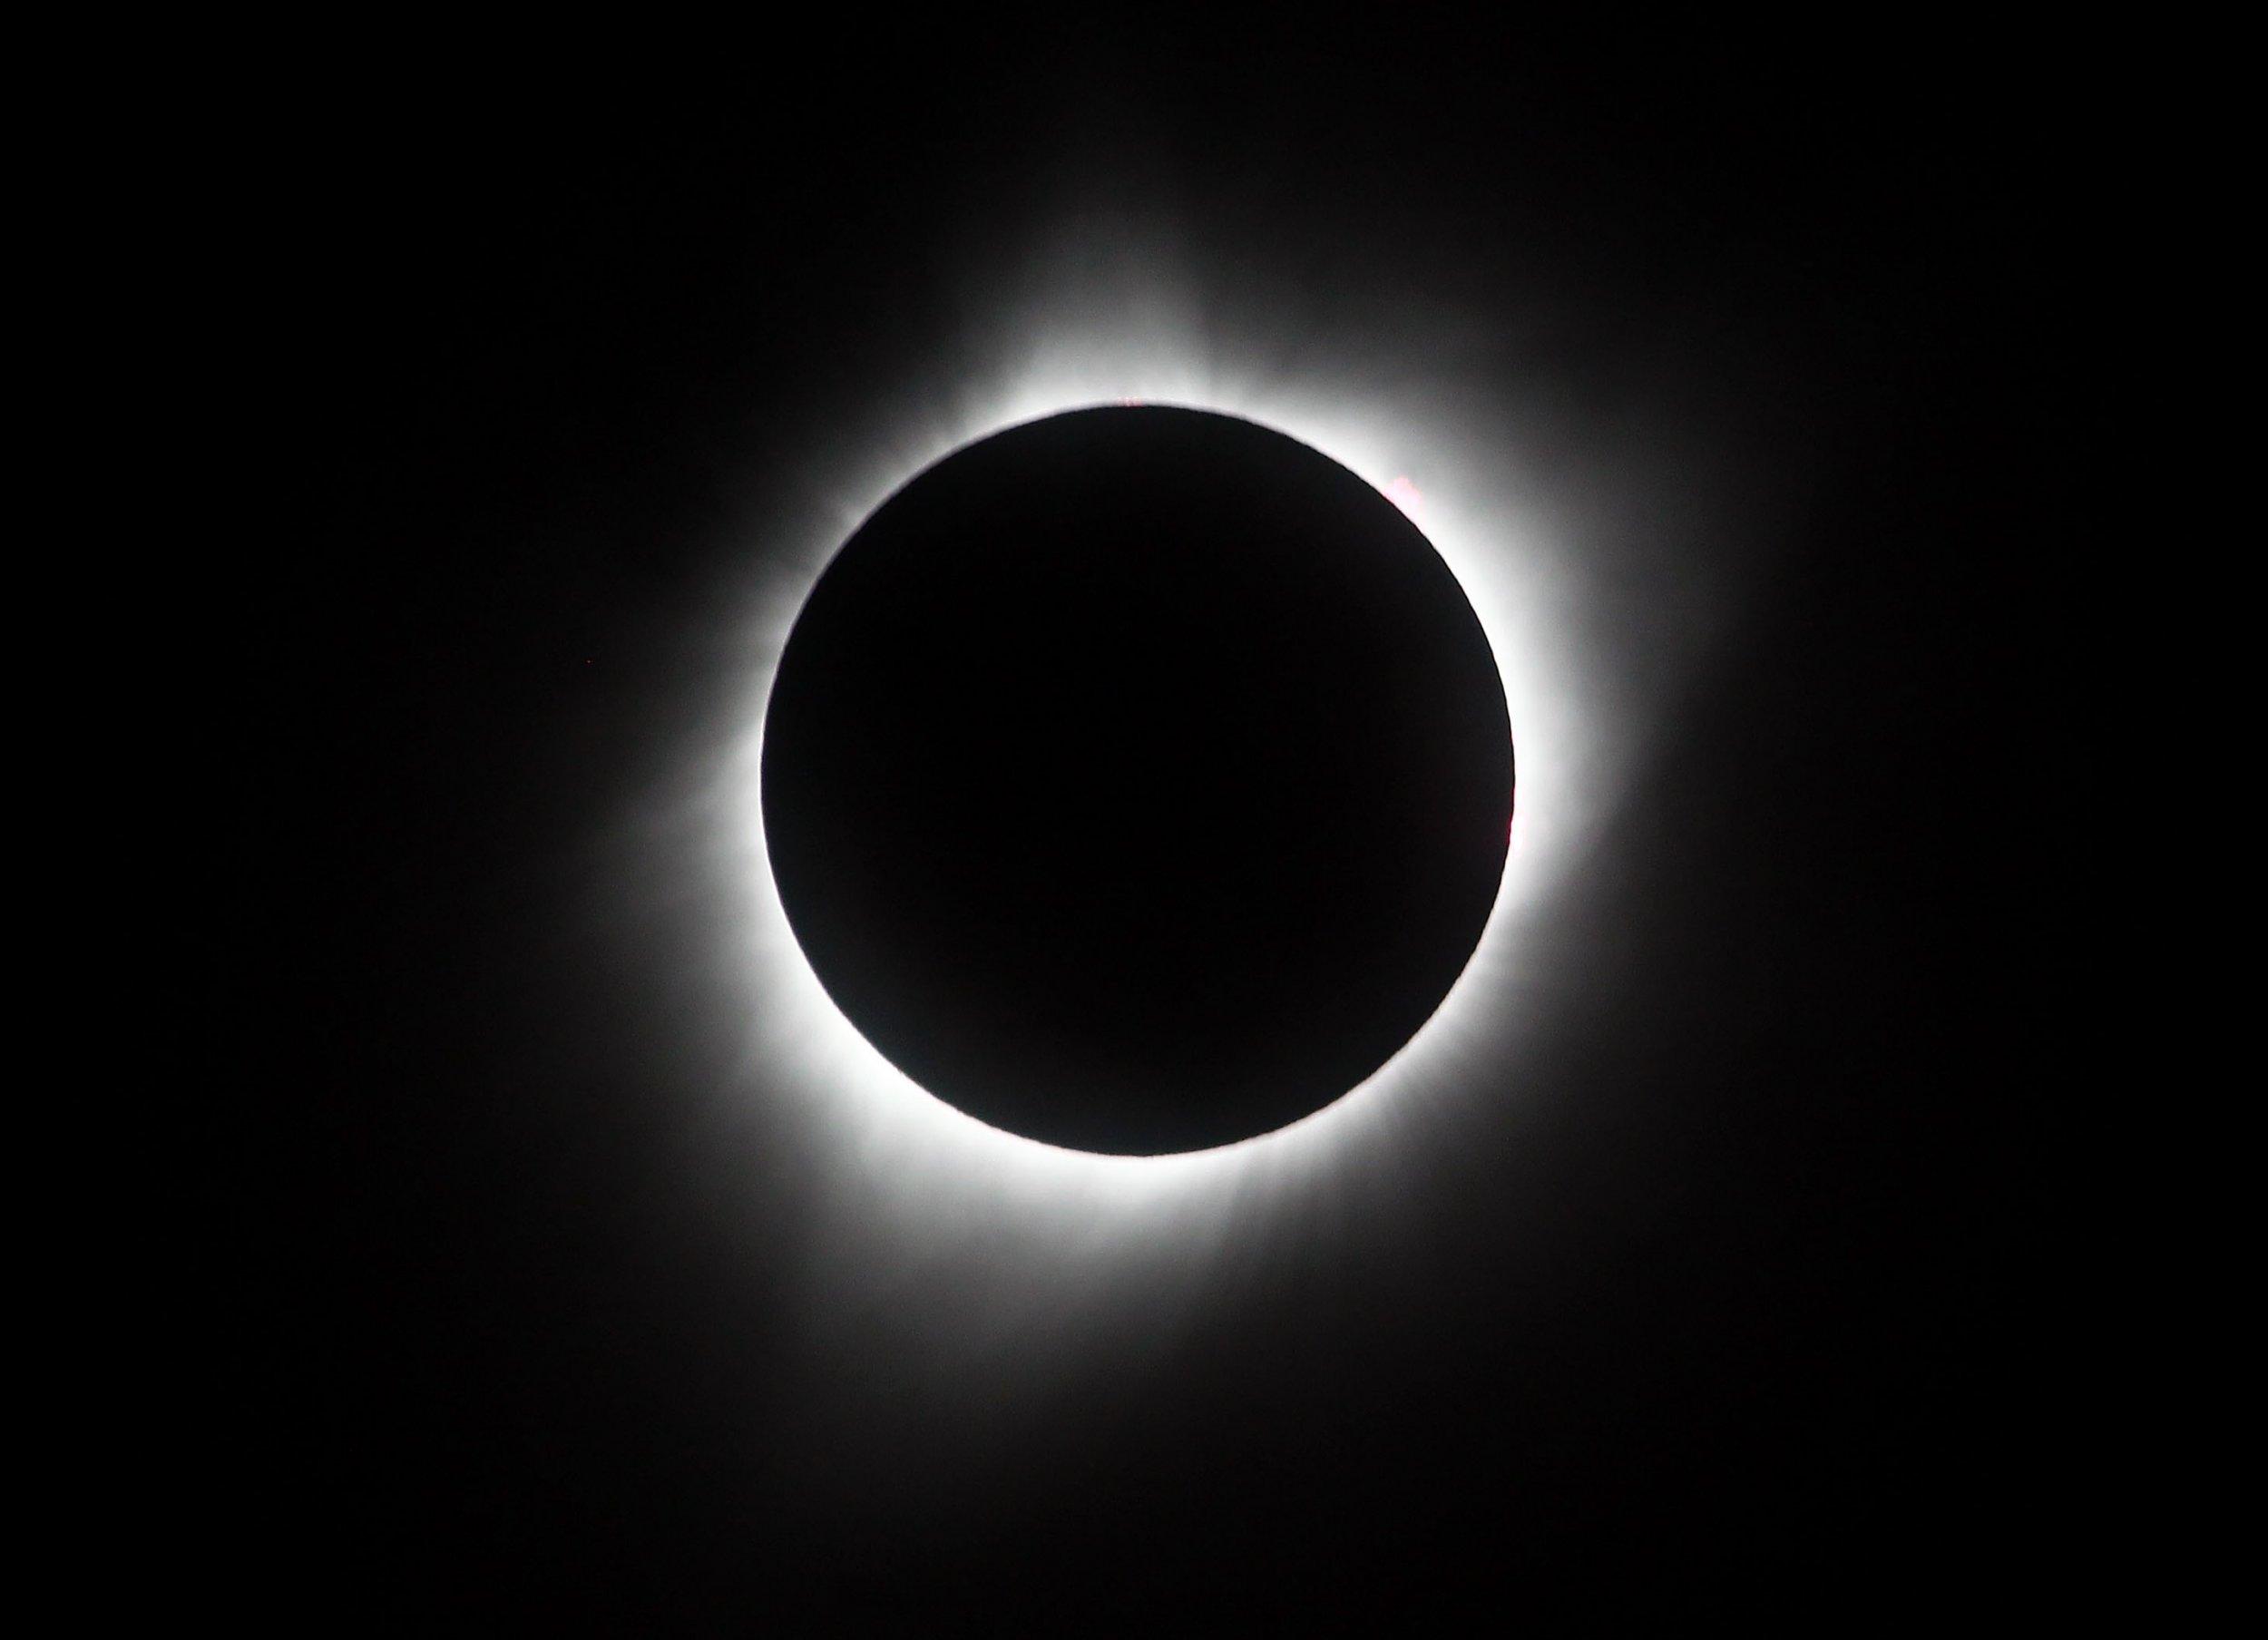 09_23_eclipse_doomsday_nibiru